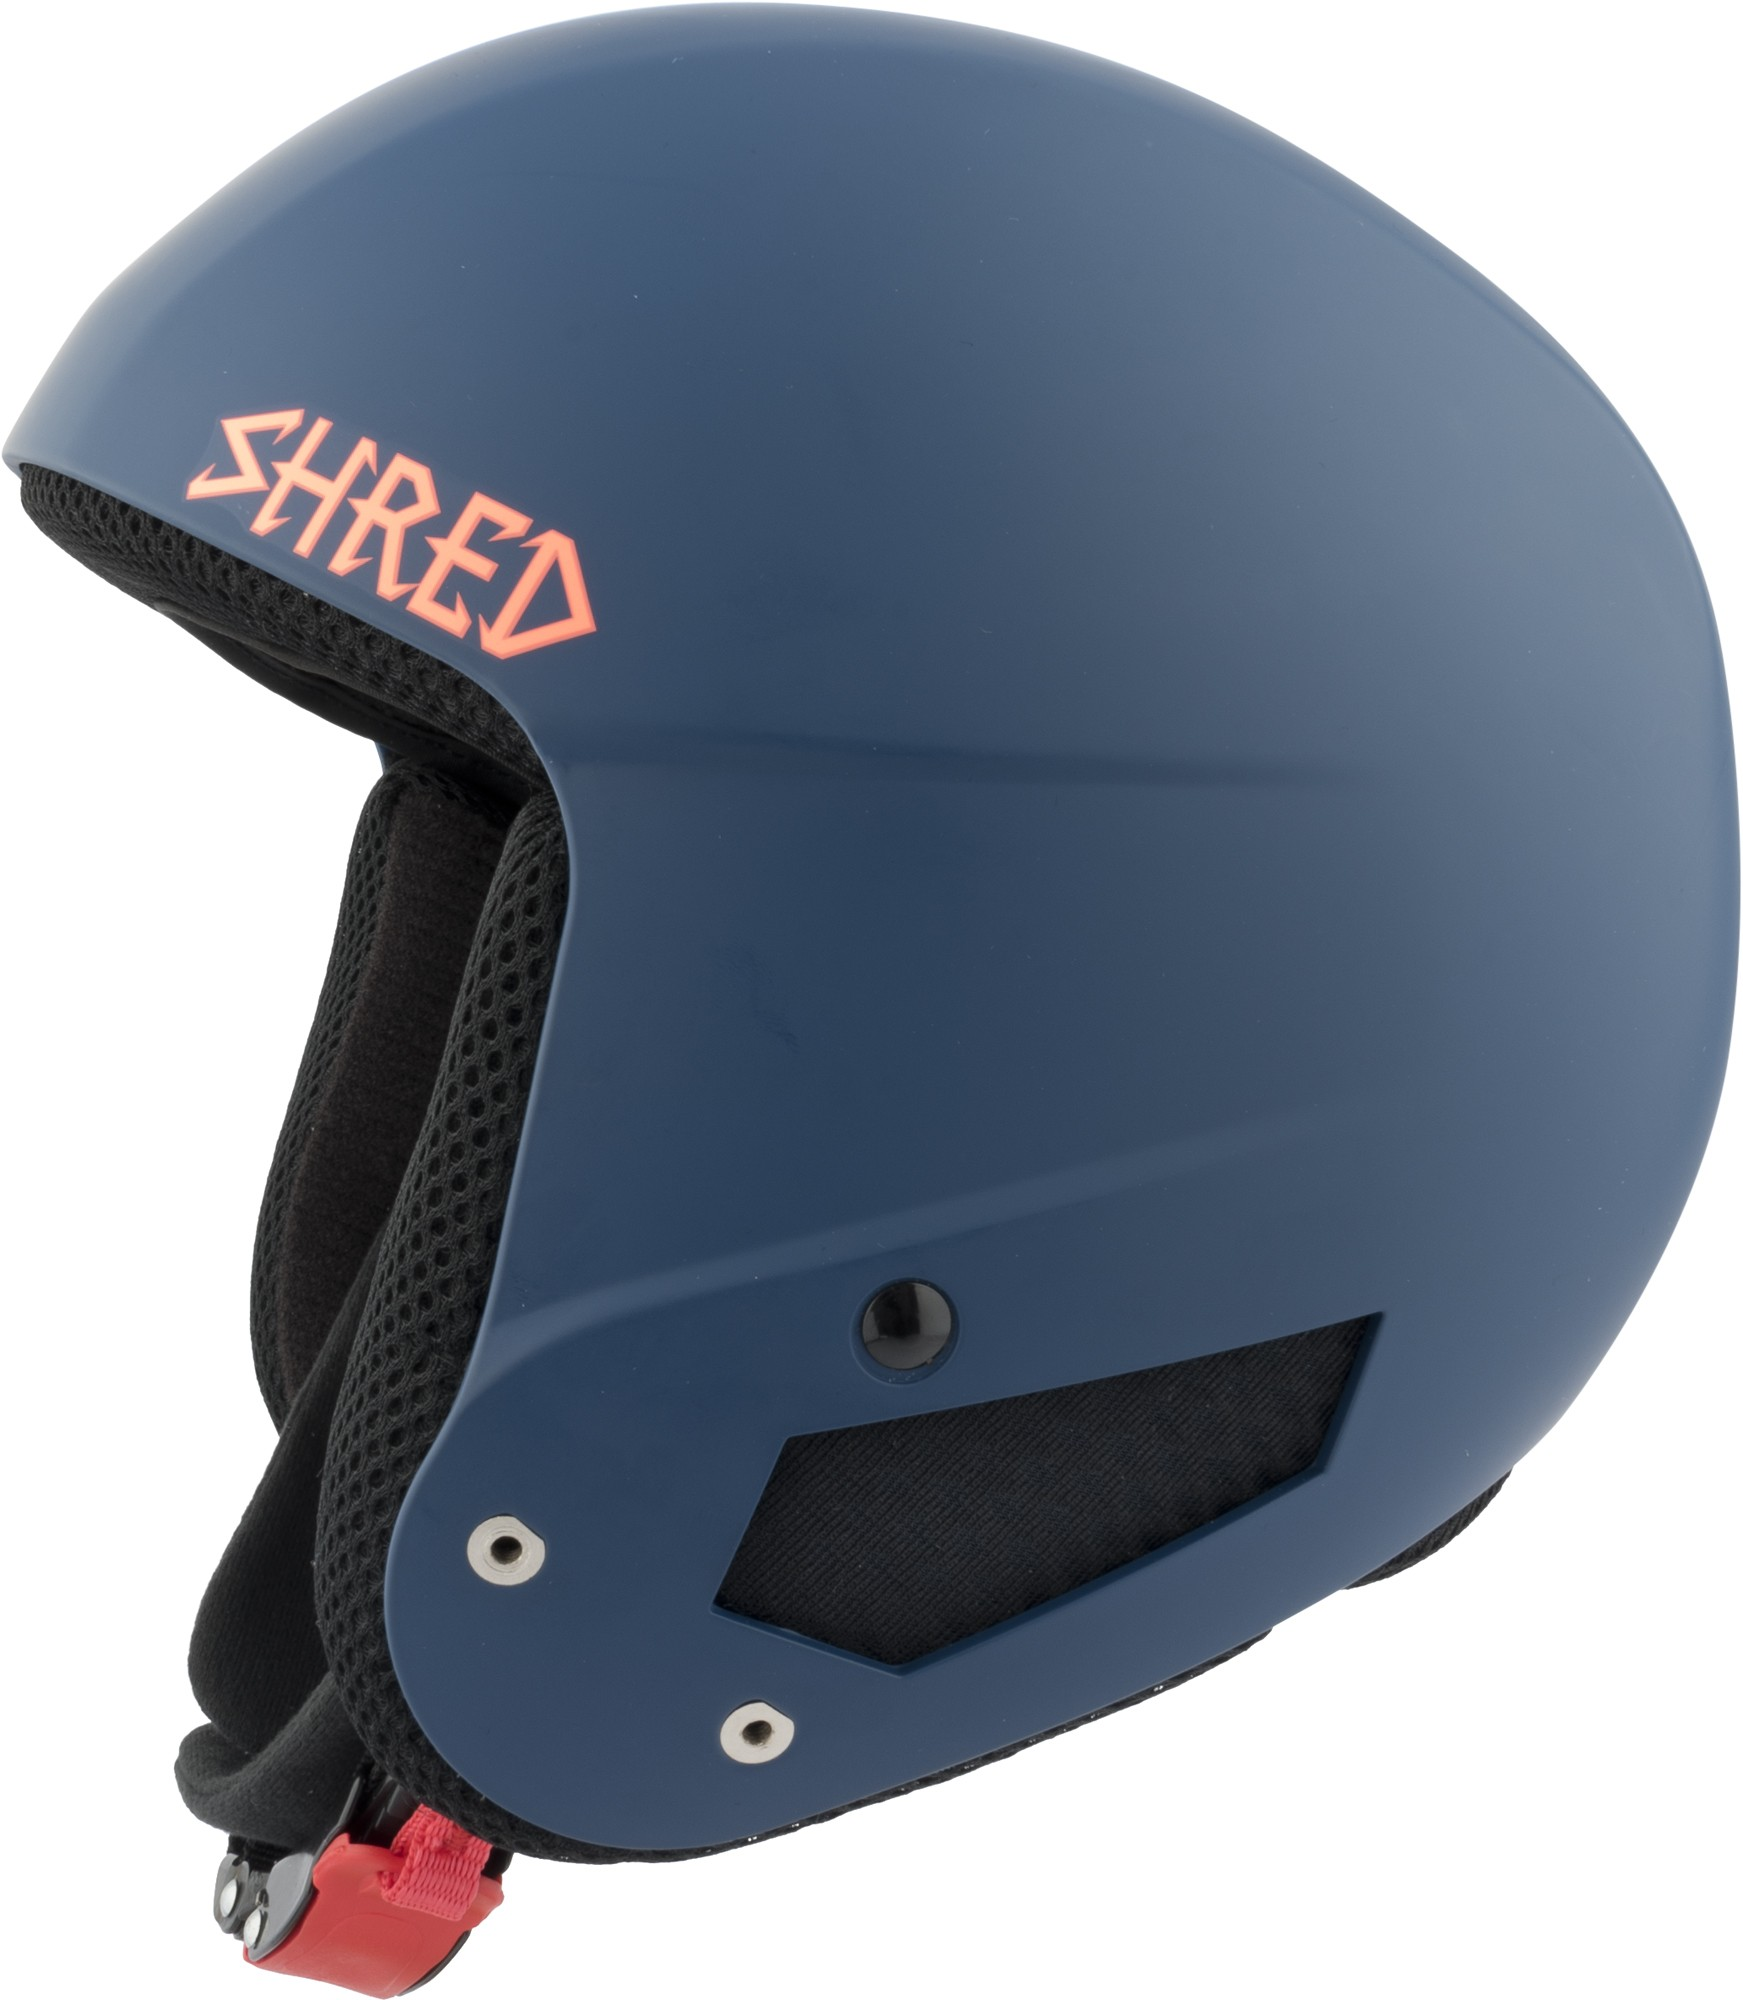 Shred Mega Brain Bucket RH FIS GRAB ski helmet, 2017